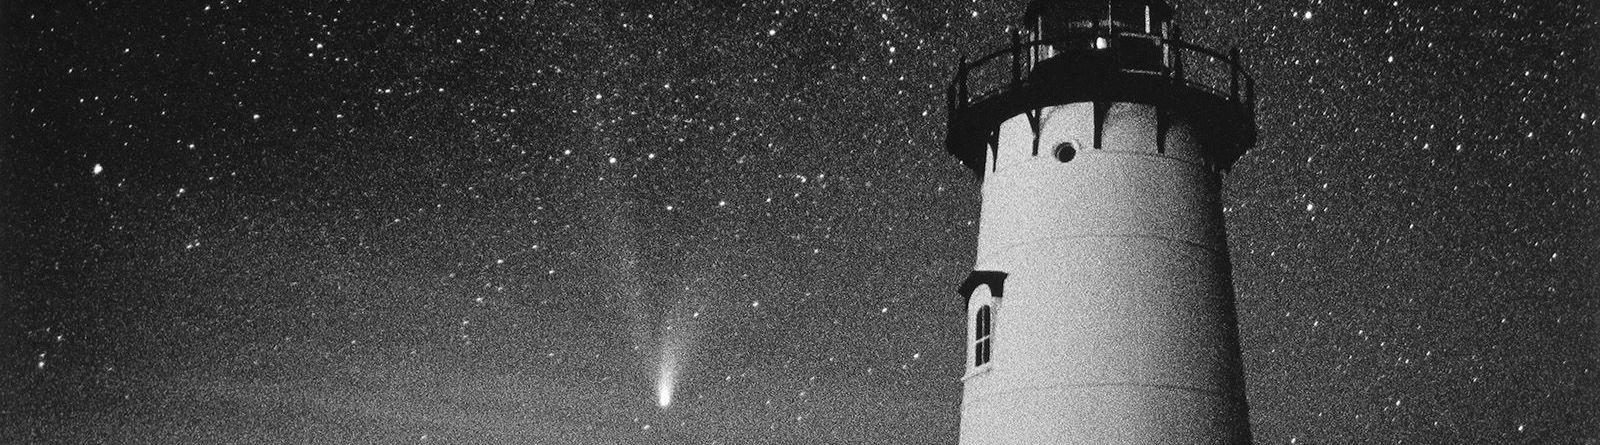 Just next to Spencer, Edgartown Comet Hale Bopp, Edgartown, MA, 1997.